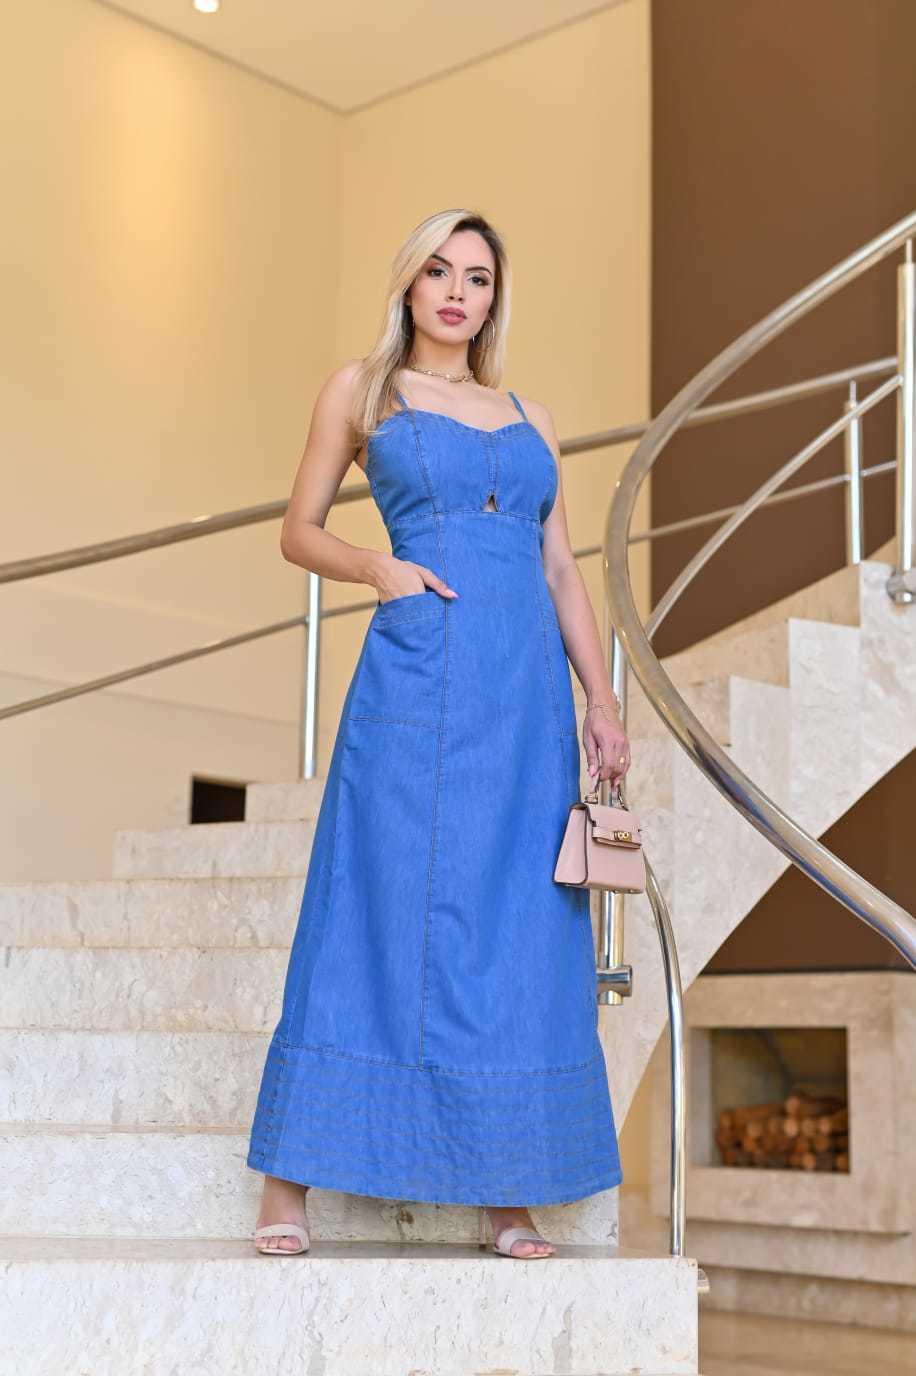 Vestido Longo Jeans Claro Recorte Vazado e Costura Prespontada Omni Vinci